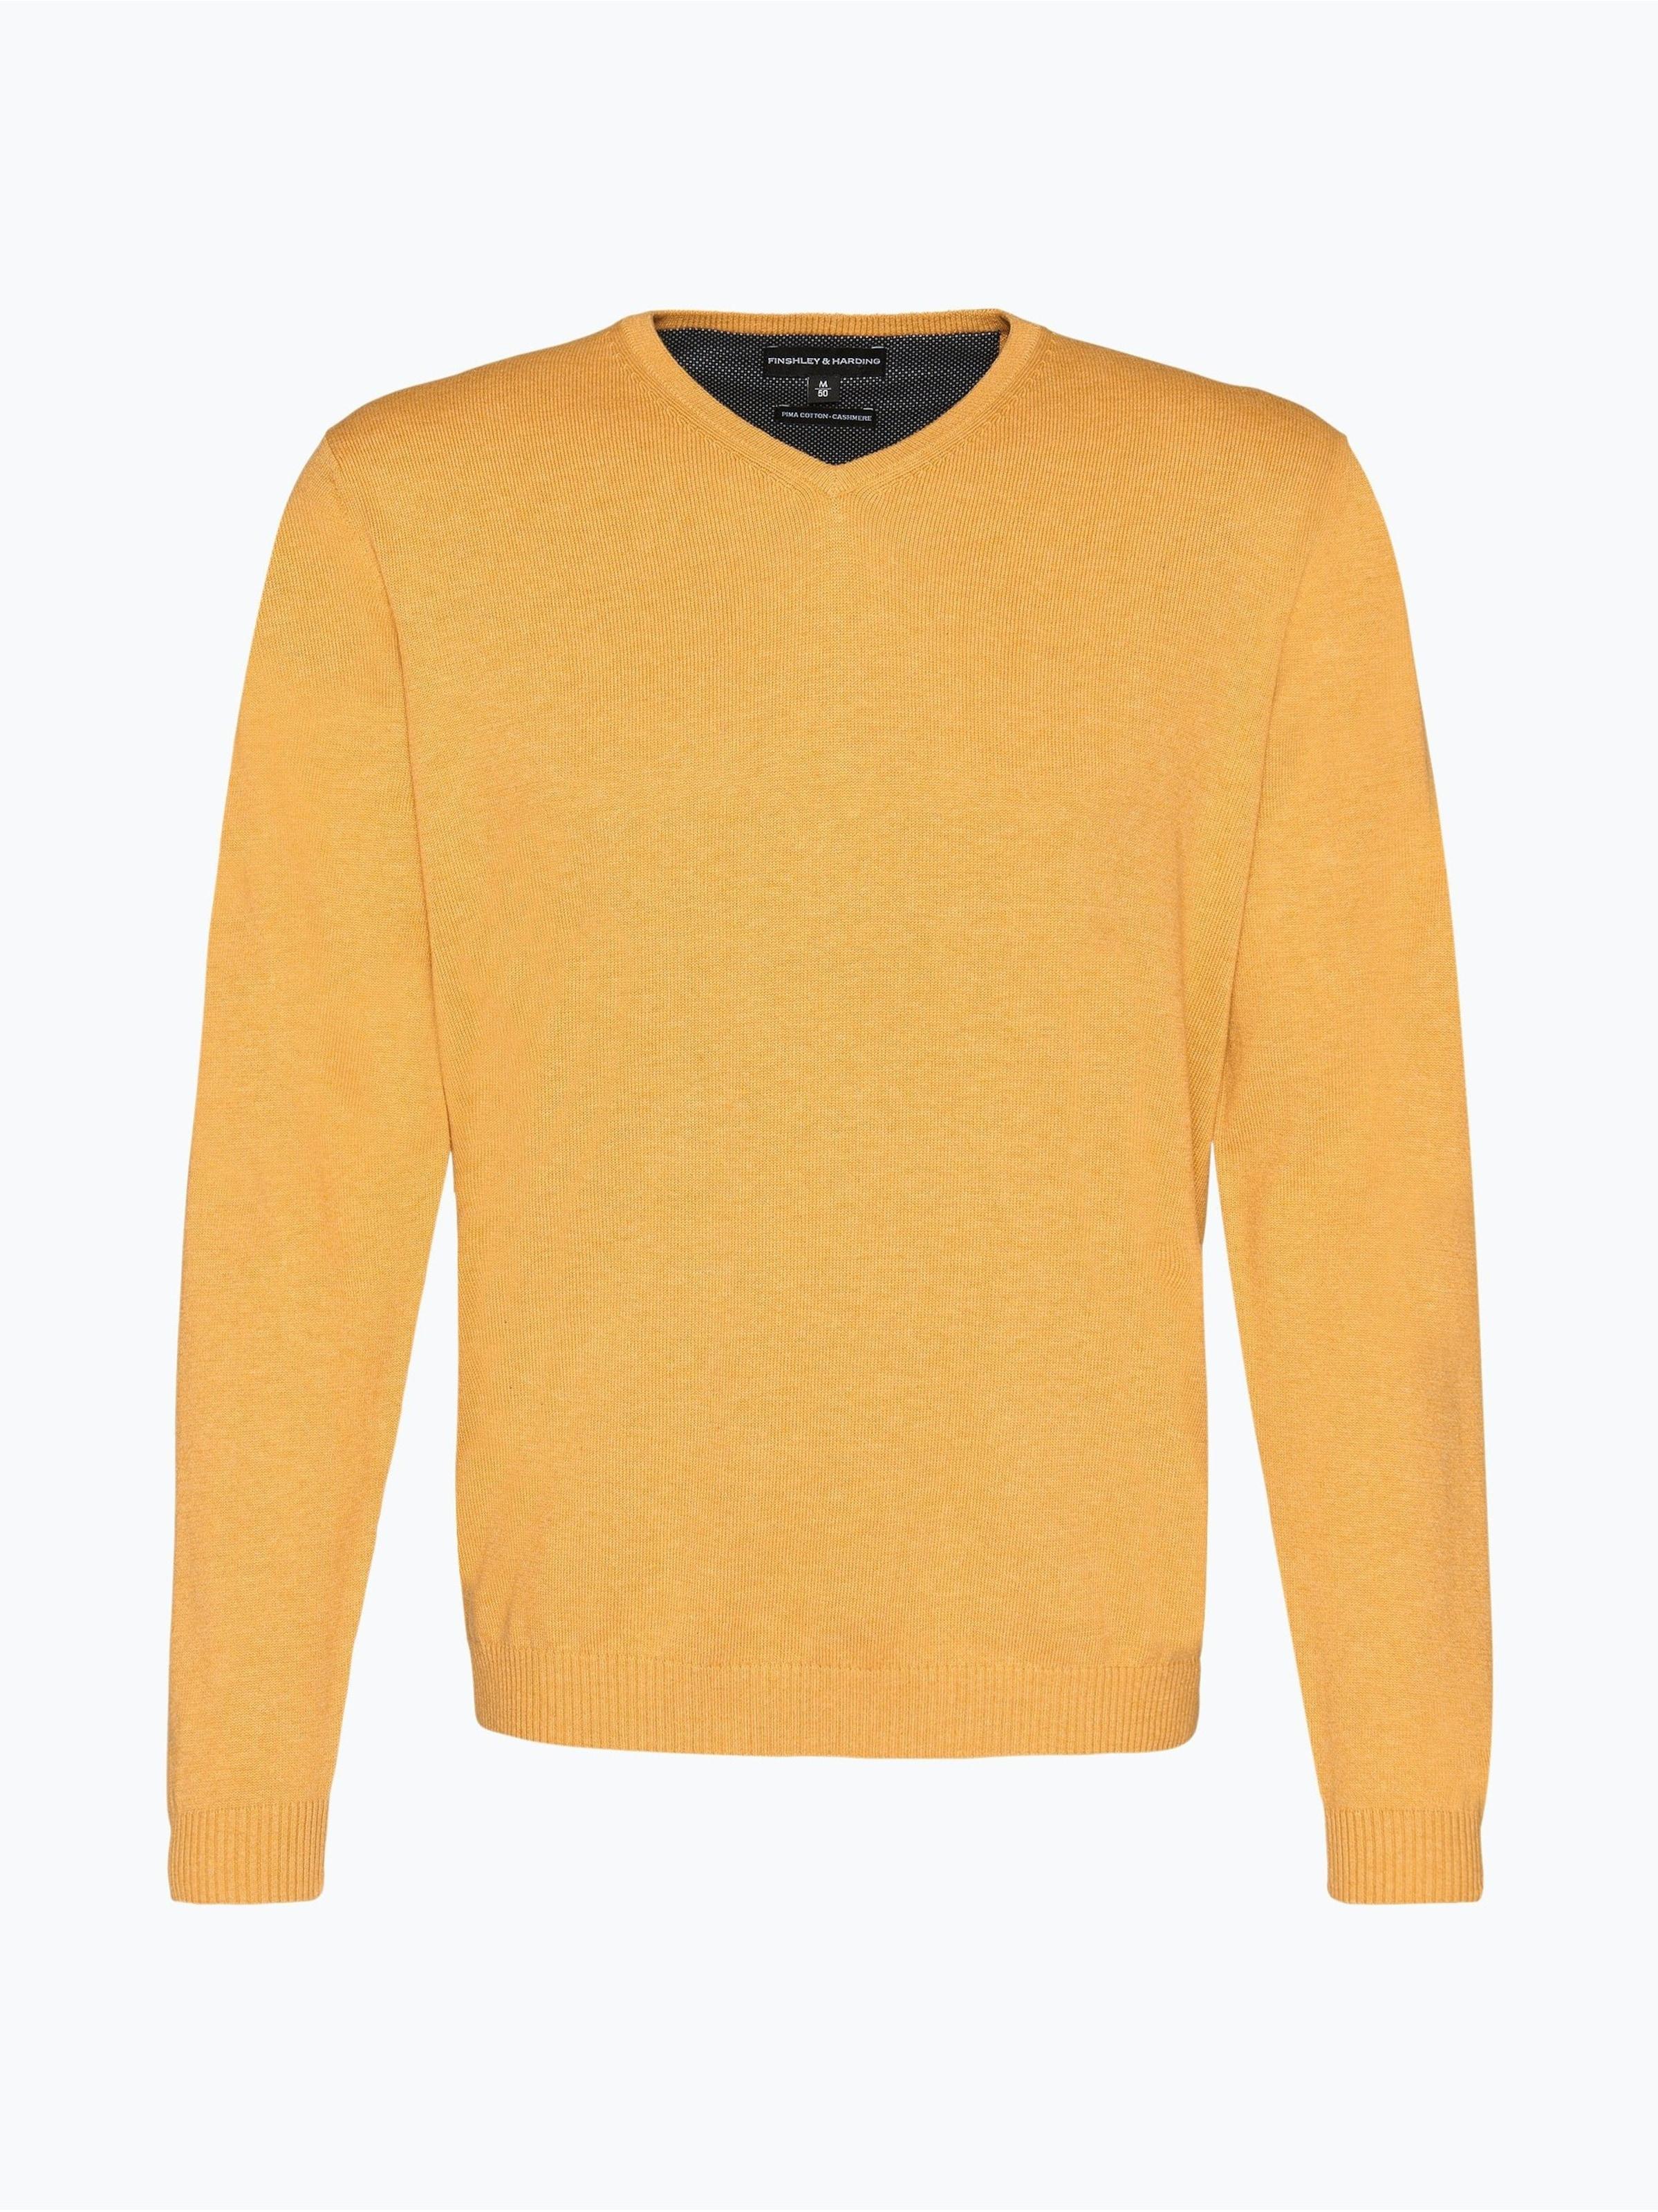 Finshleyamp; In Goldgelb Pullover Goldgelb Pullover In Finshleyamp; Harding Harding Finshleyamp; rBxsQthdC